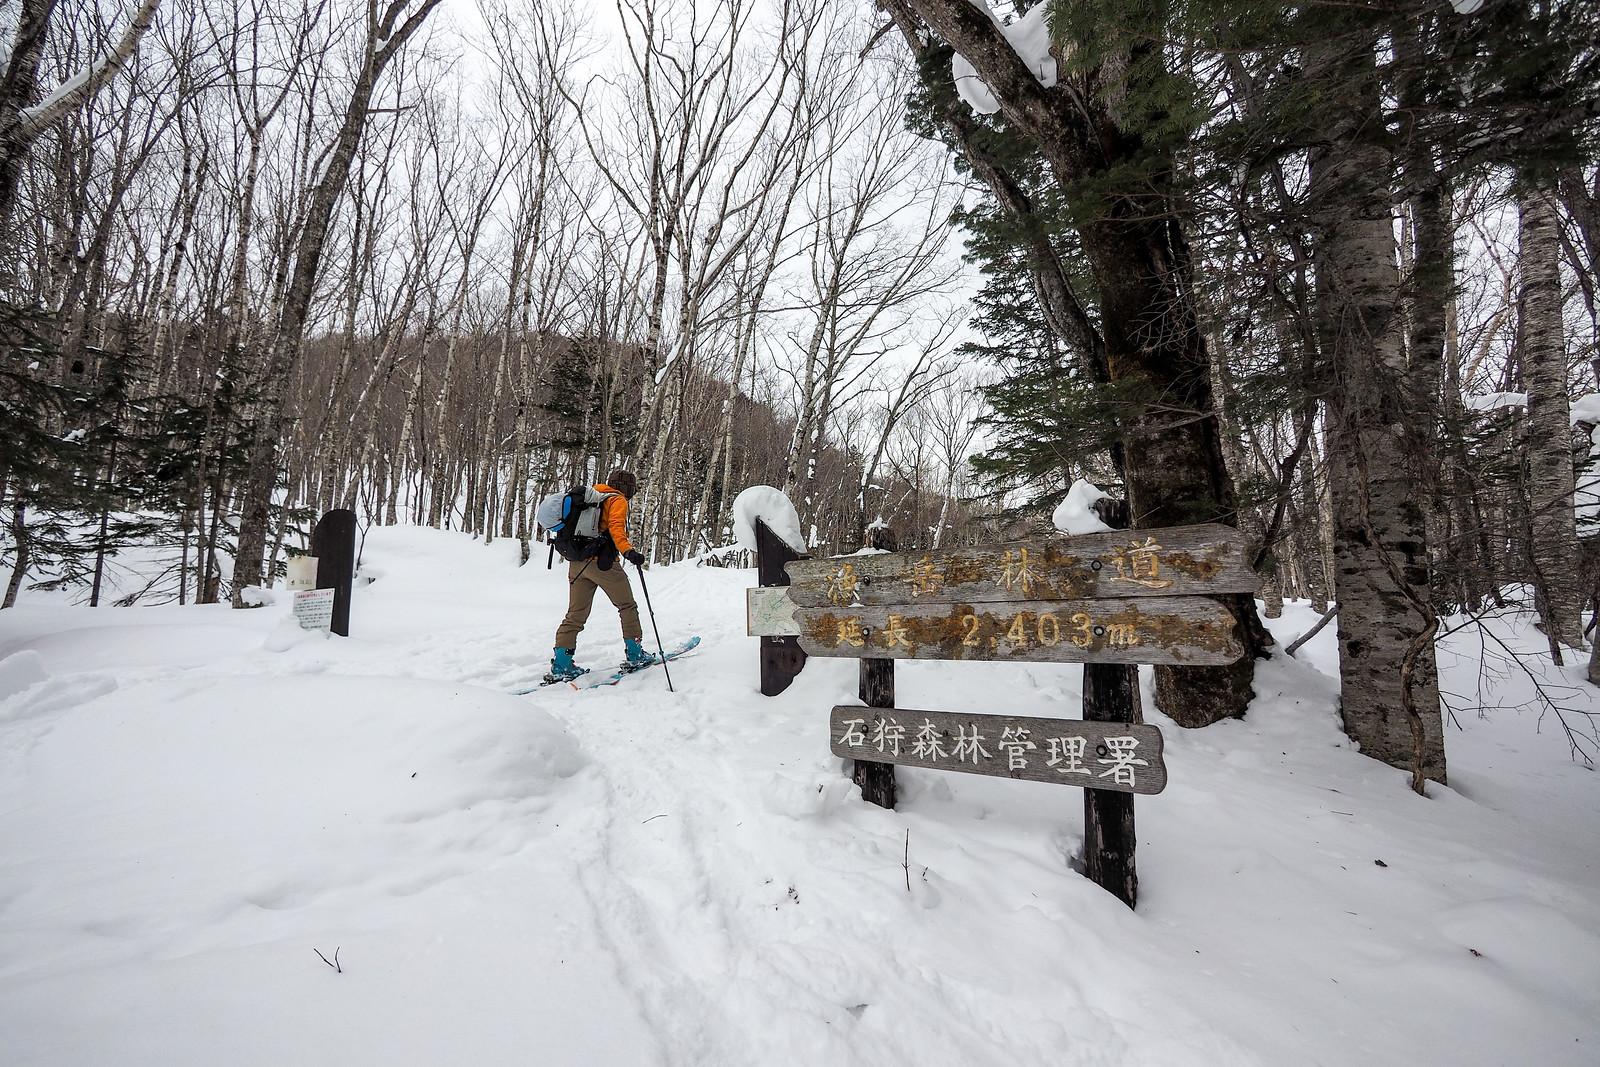 Mt. Okotanpe ski touring (Hokkaido, Japan)